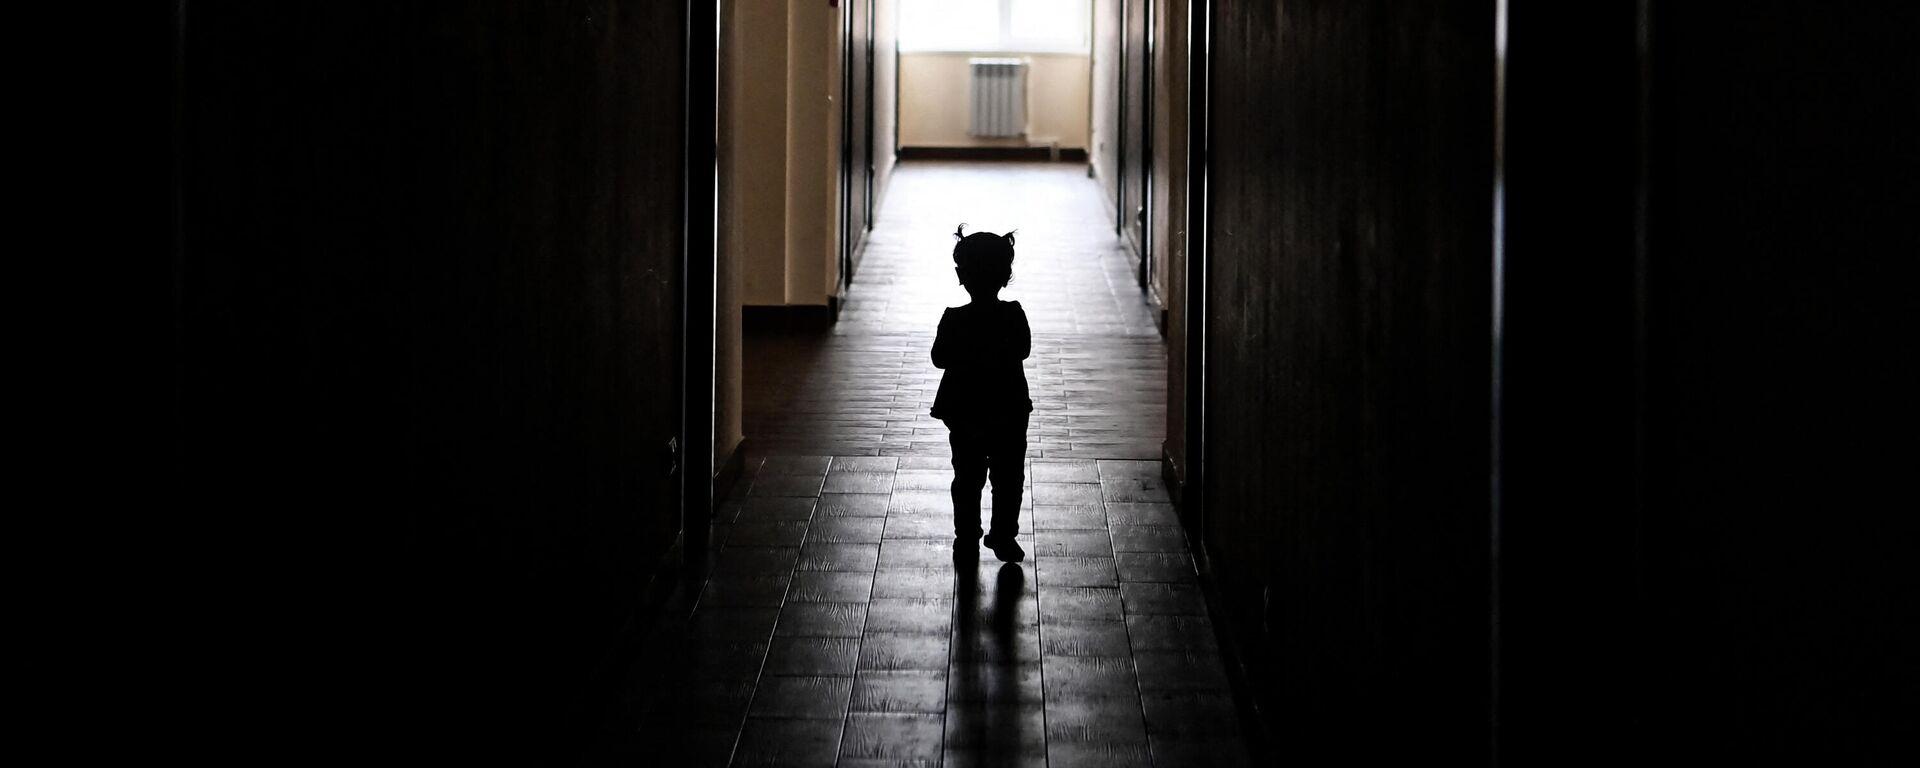 Ребенок идет по коридору, иллюстративное фото - Sputnik Узбекистан, 1920, 26.03.2021